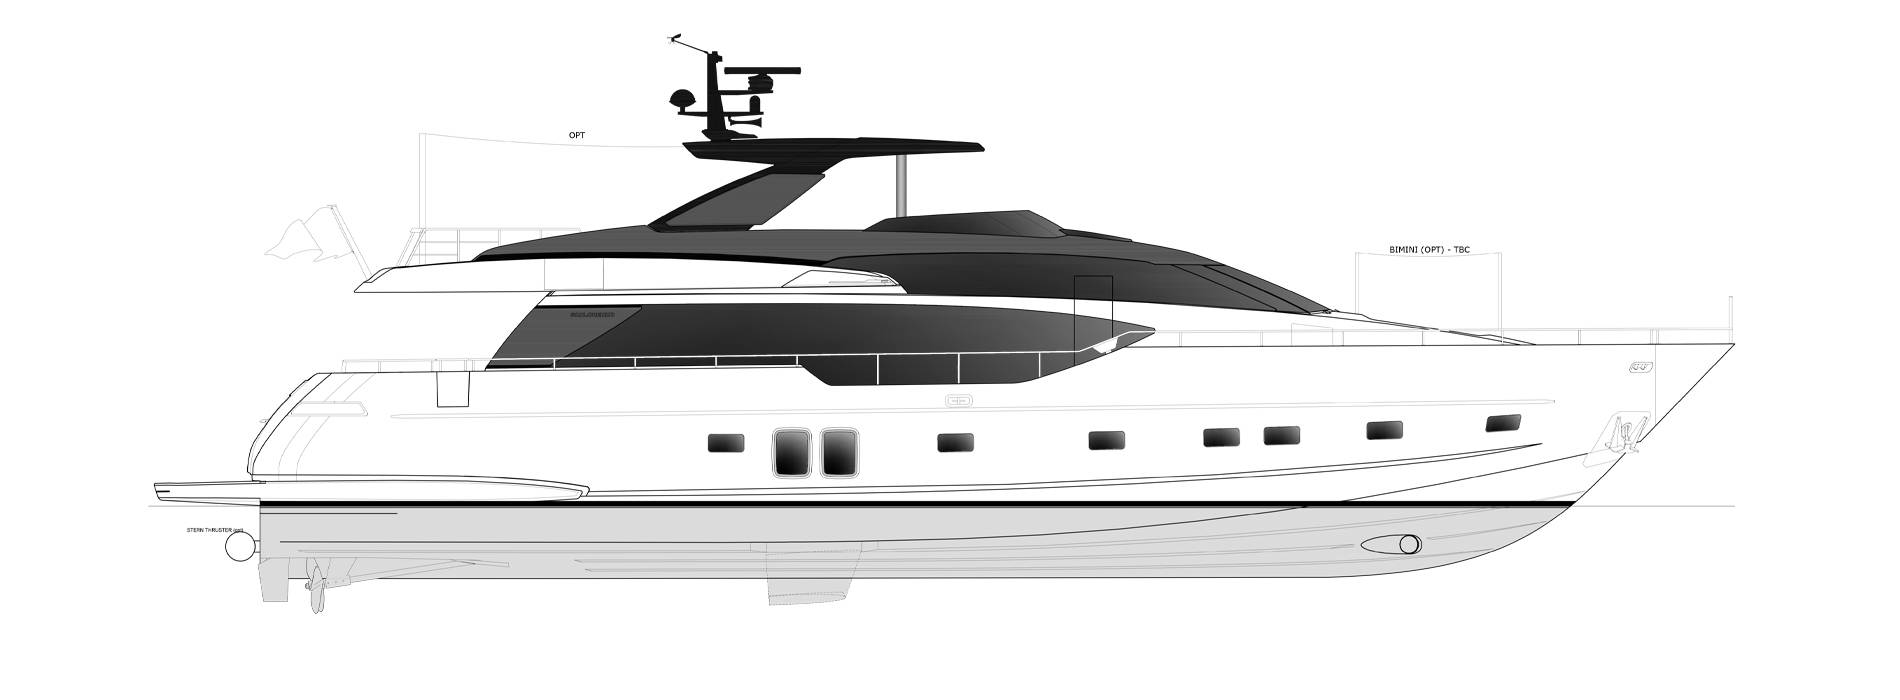 Sanlorenzo Yachts SL86-727 Perfil